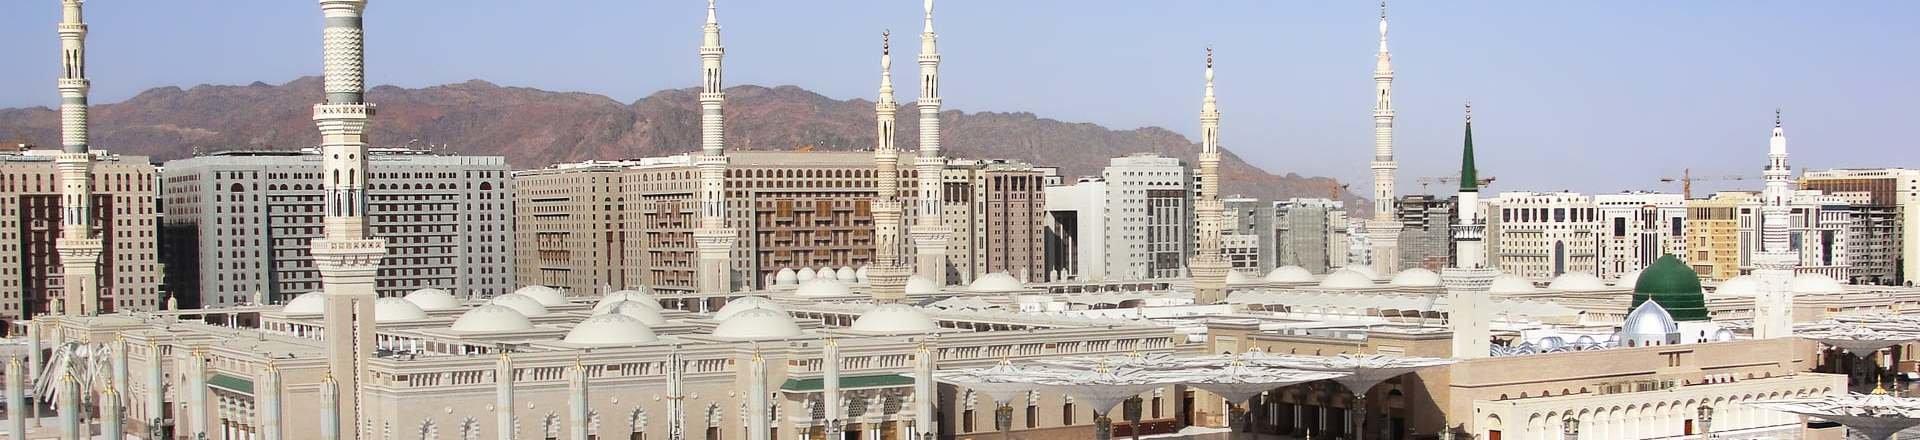 Star Travel Agency Dammam